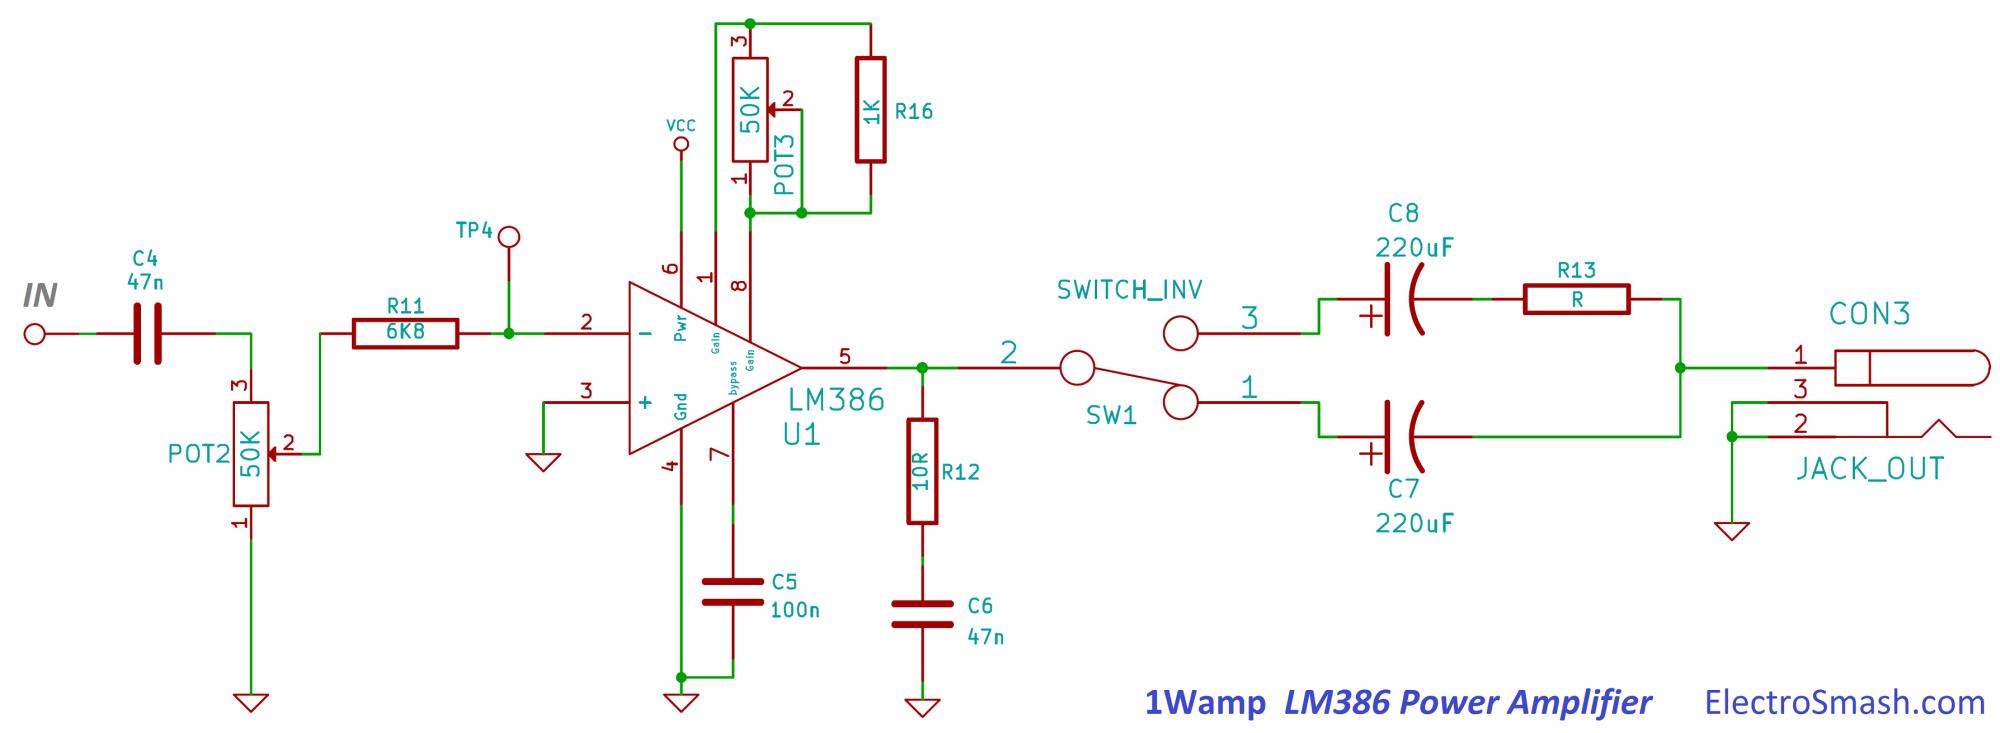 hight resolution of 1wamp lm386 power amplifier circuit